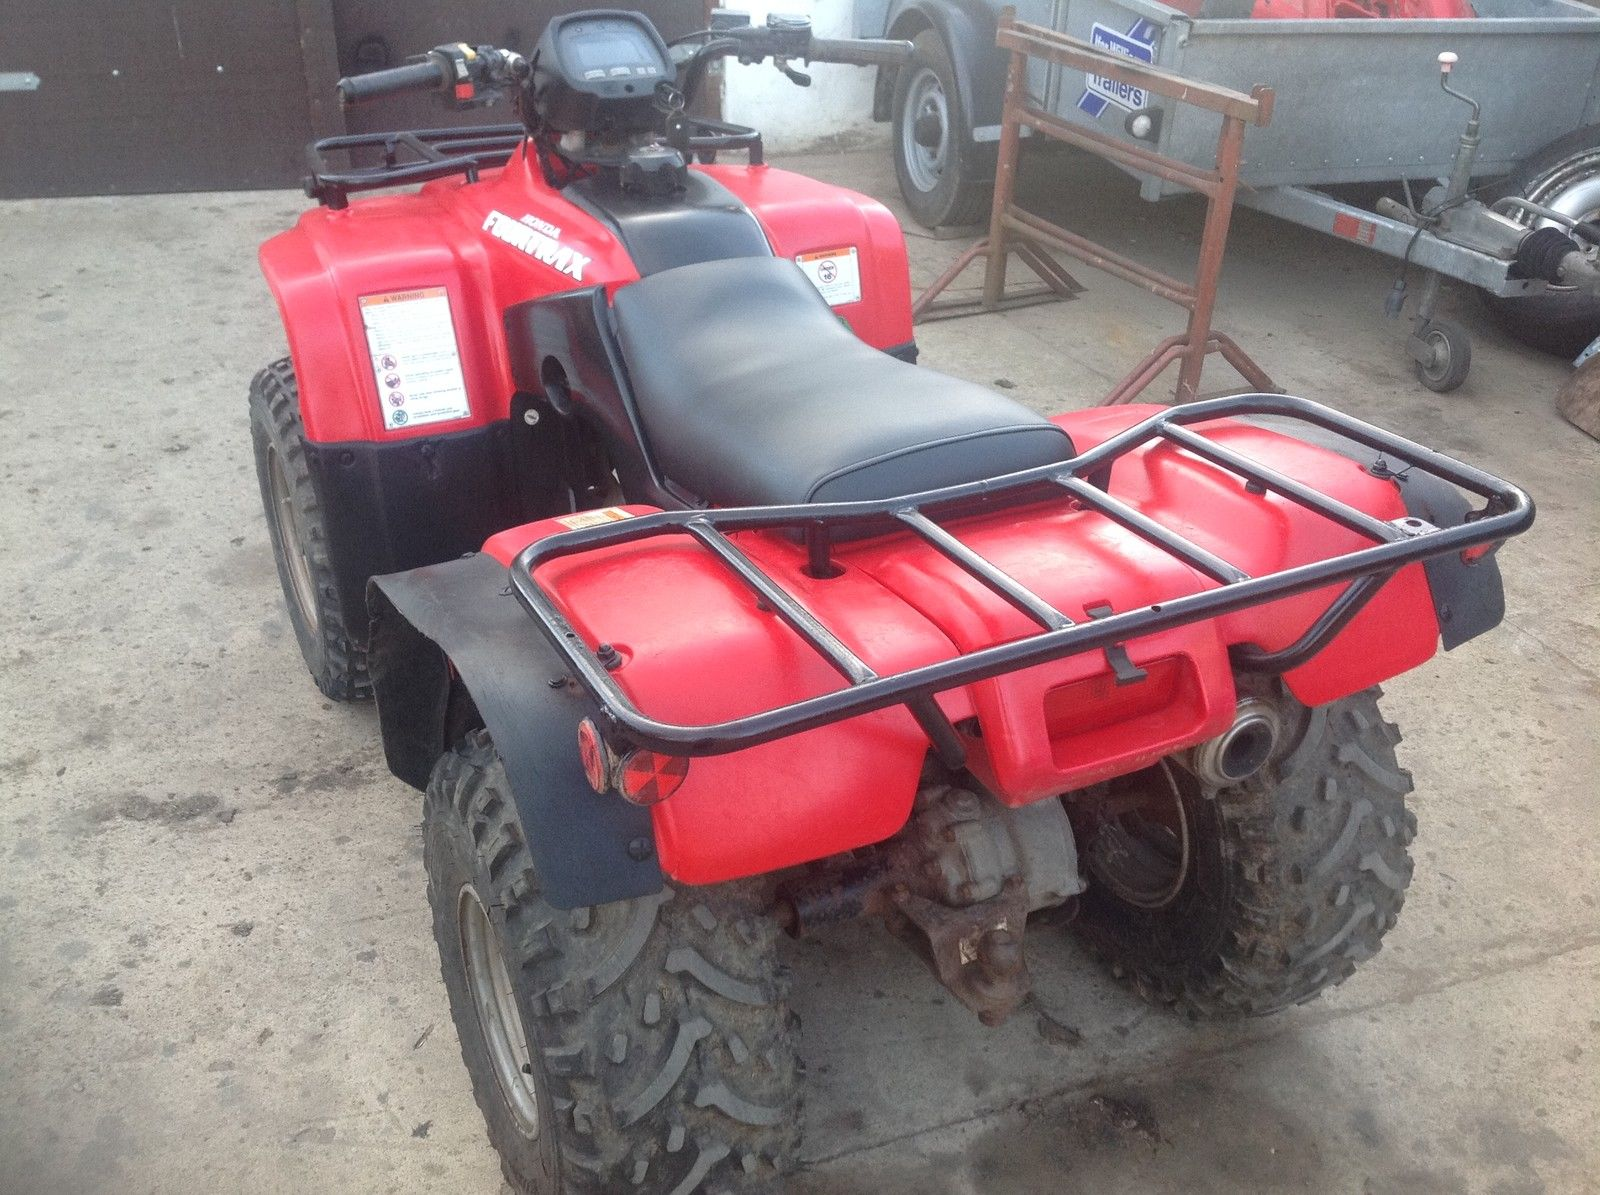 Honda Trx 250 Farm Quad Atv Big Red Fourtrax